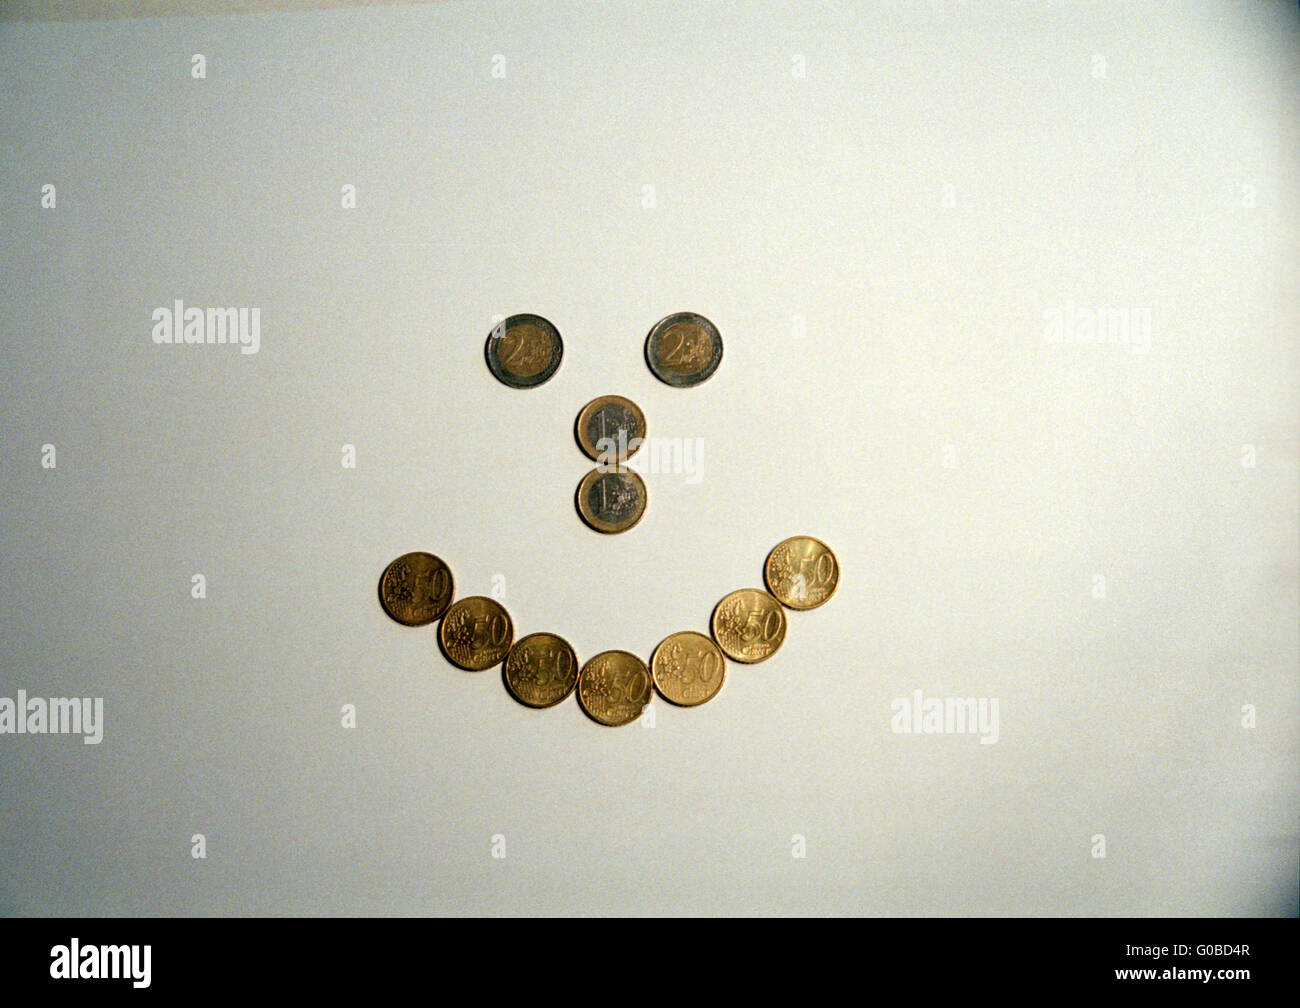 Money makes you happy - Stock Image